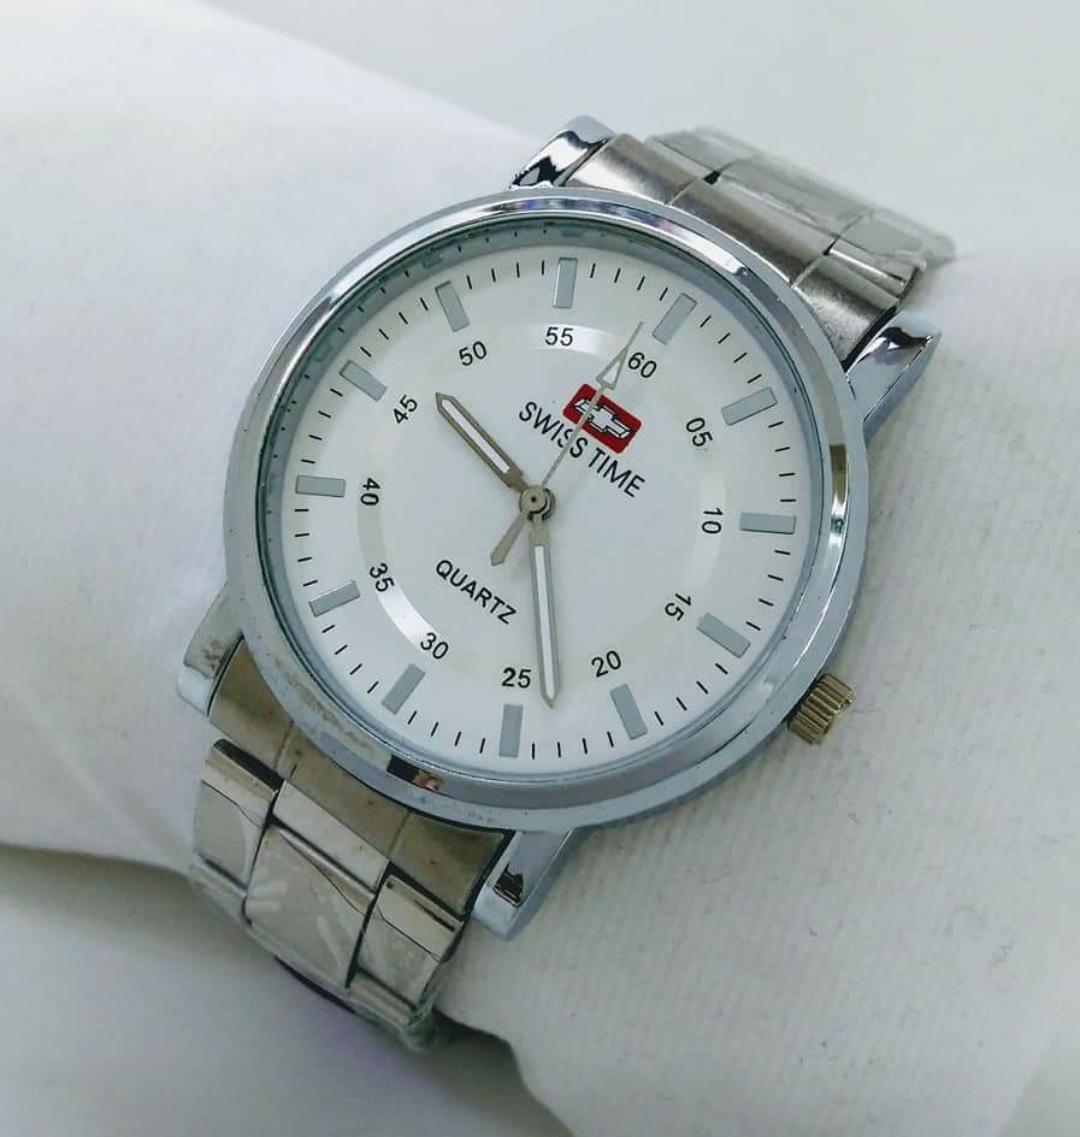 Swiss Army - Jam Tangan Fashion Pria - Tali Rantai Stainless Steel - Limited Edition